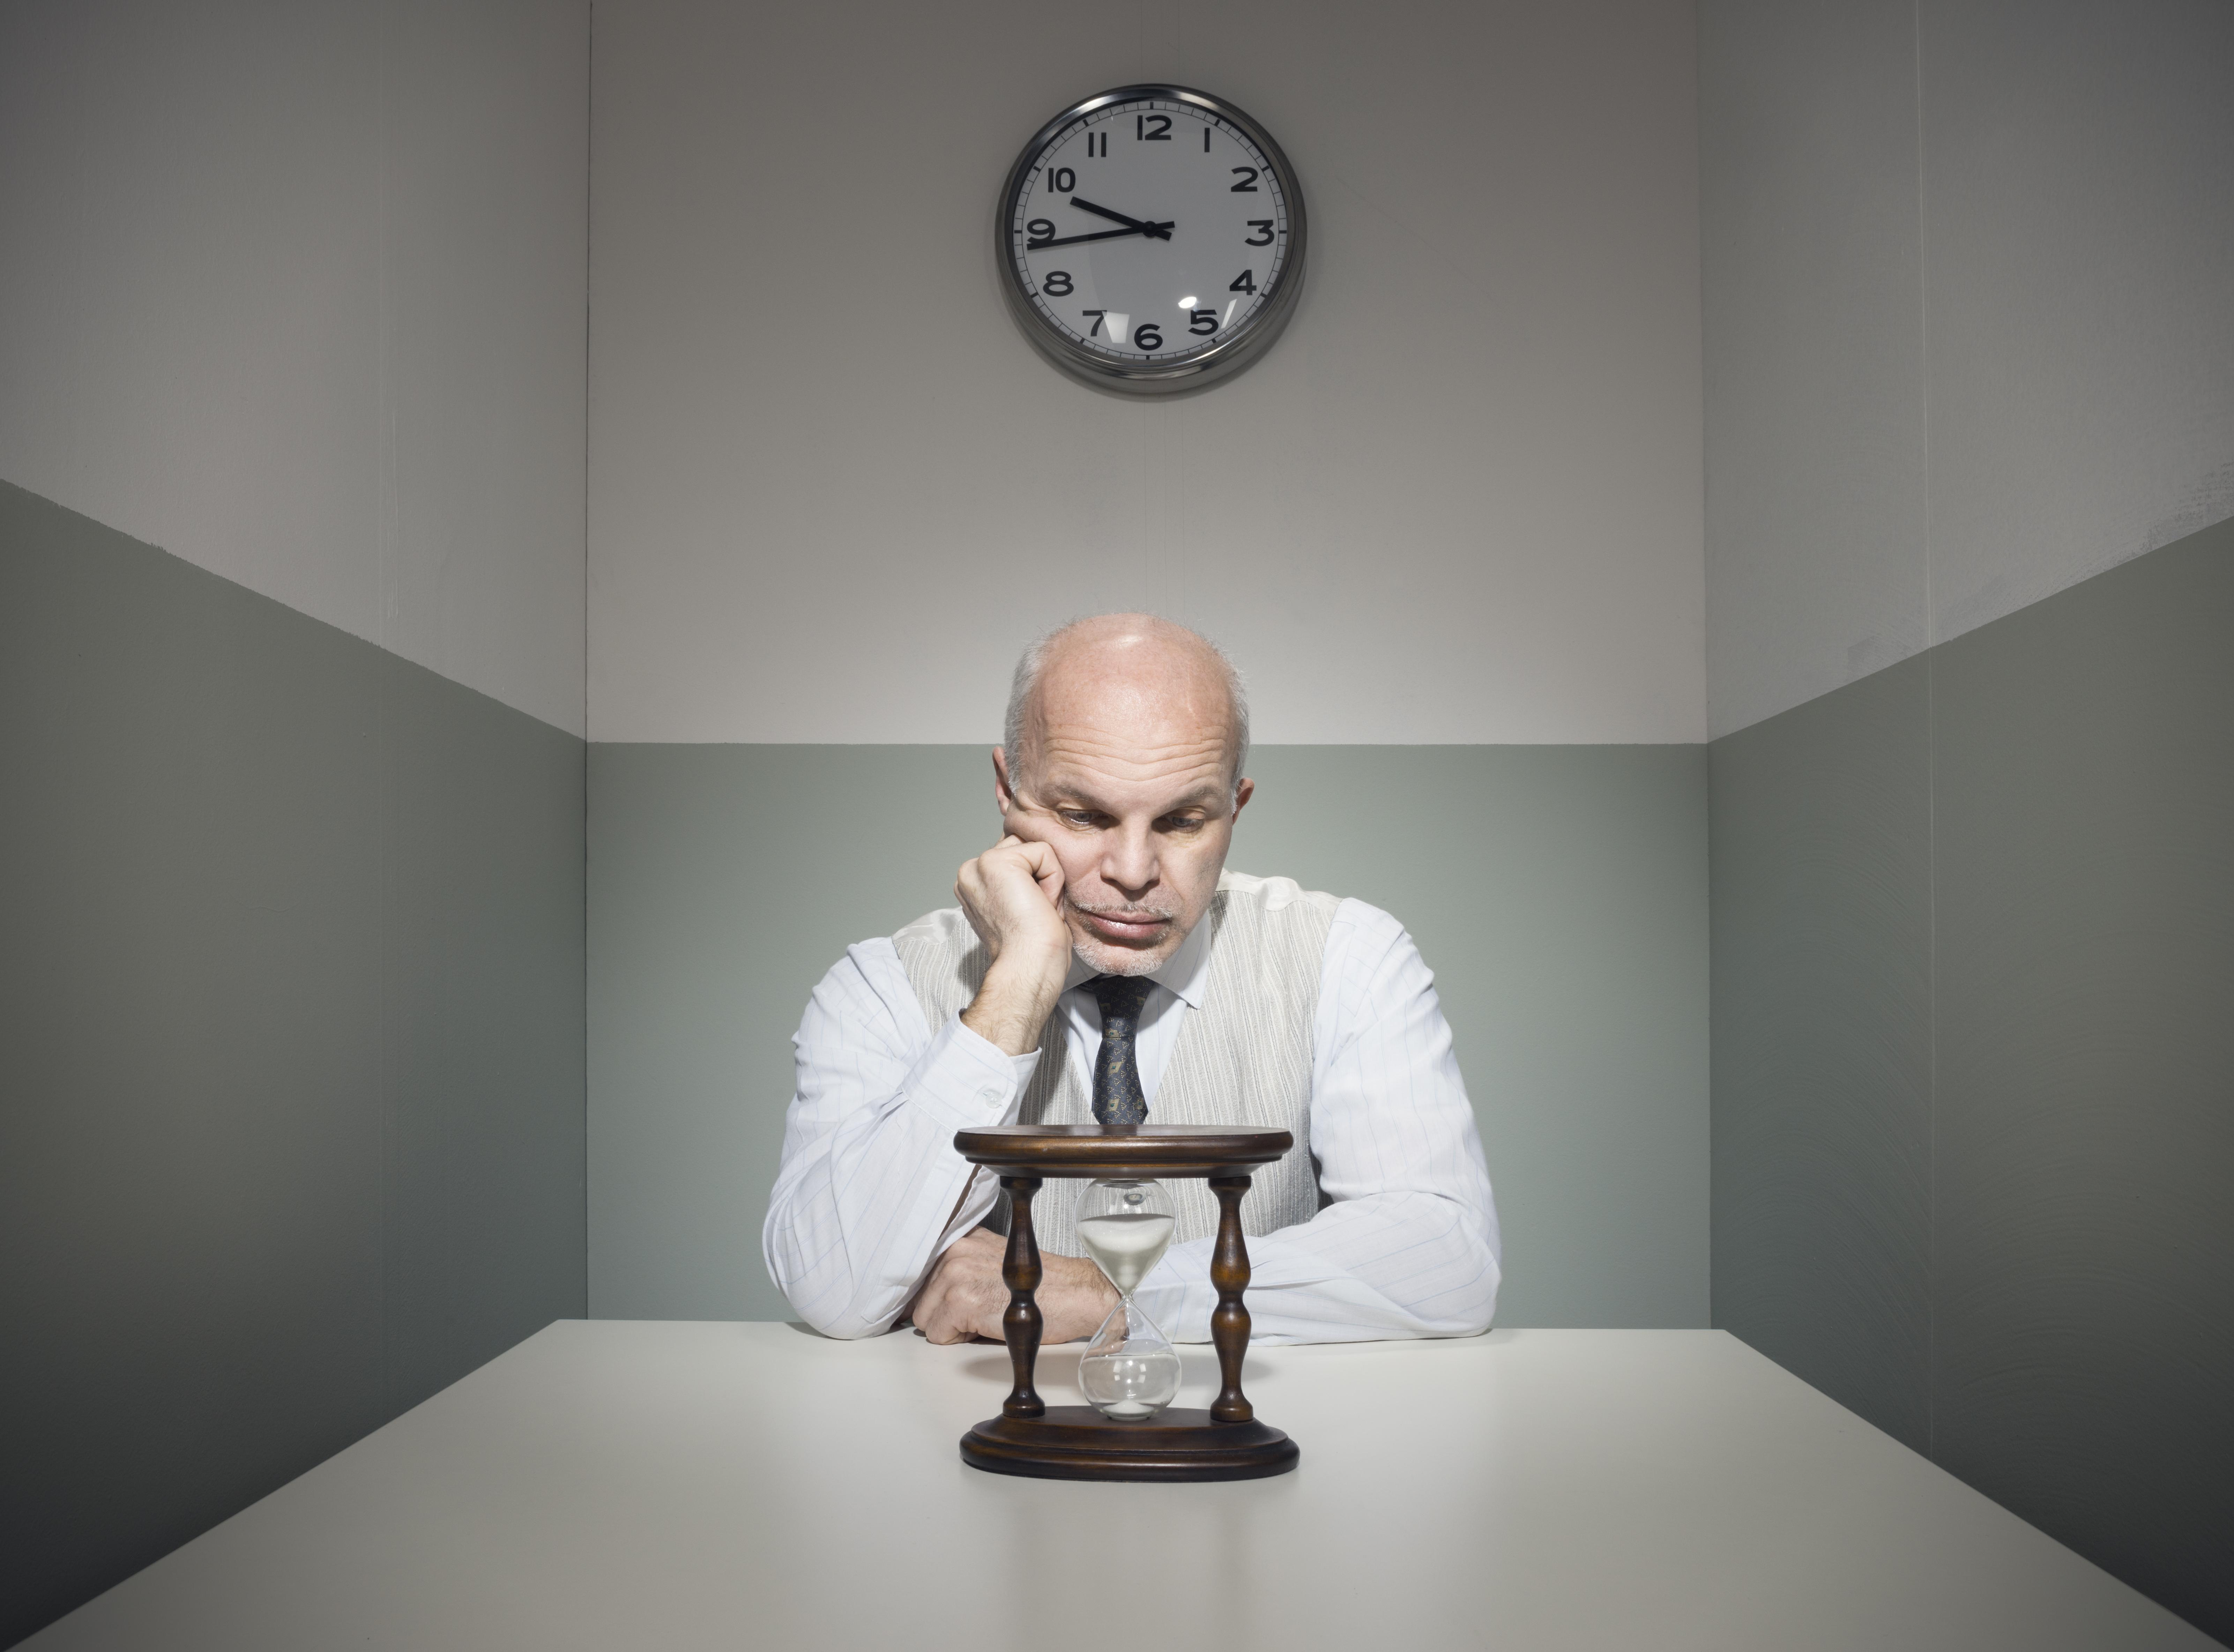 Man staring at hourglass